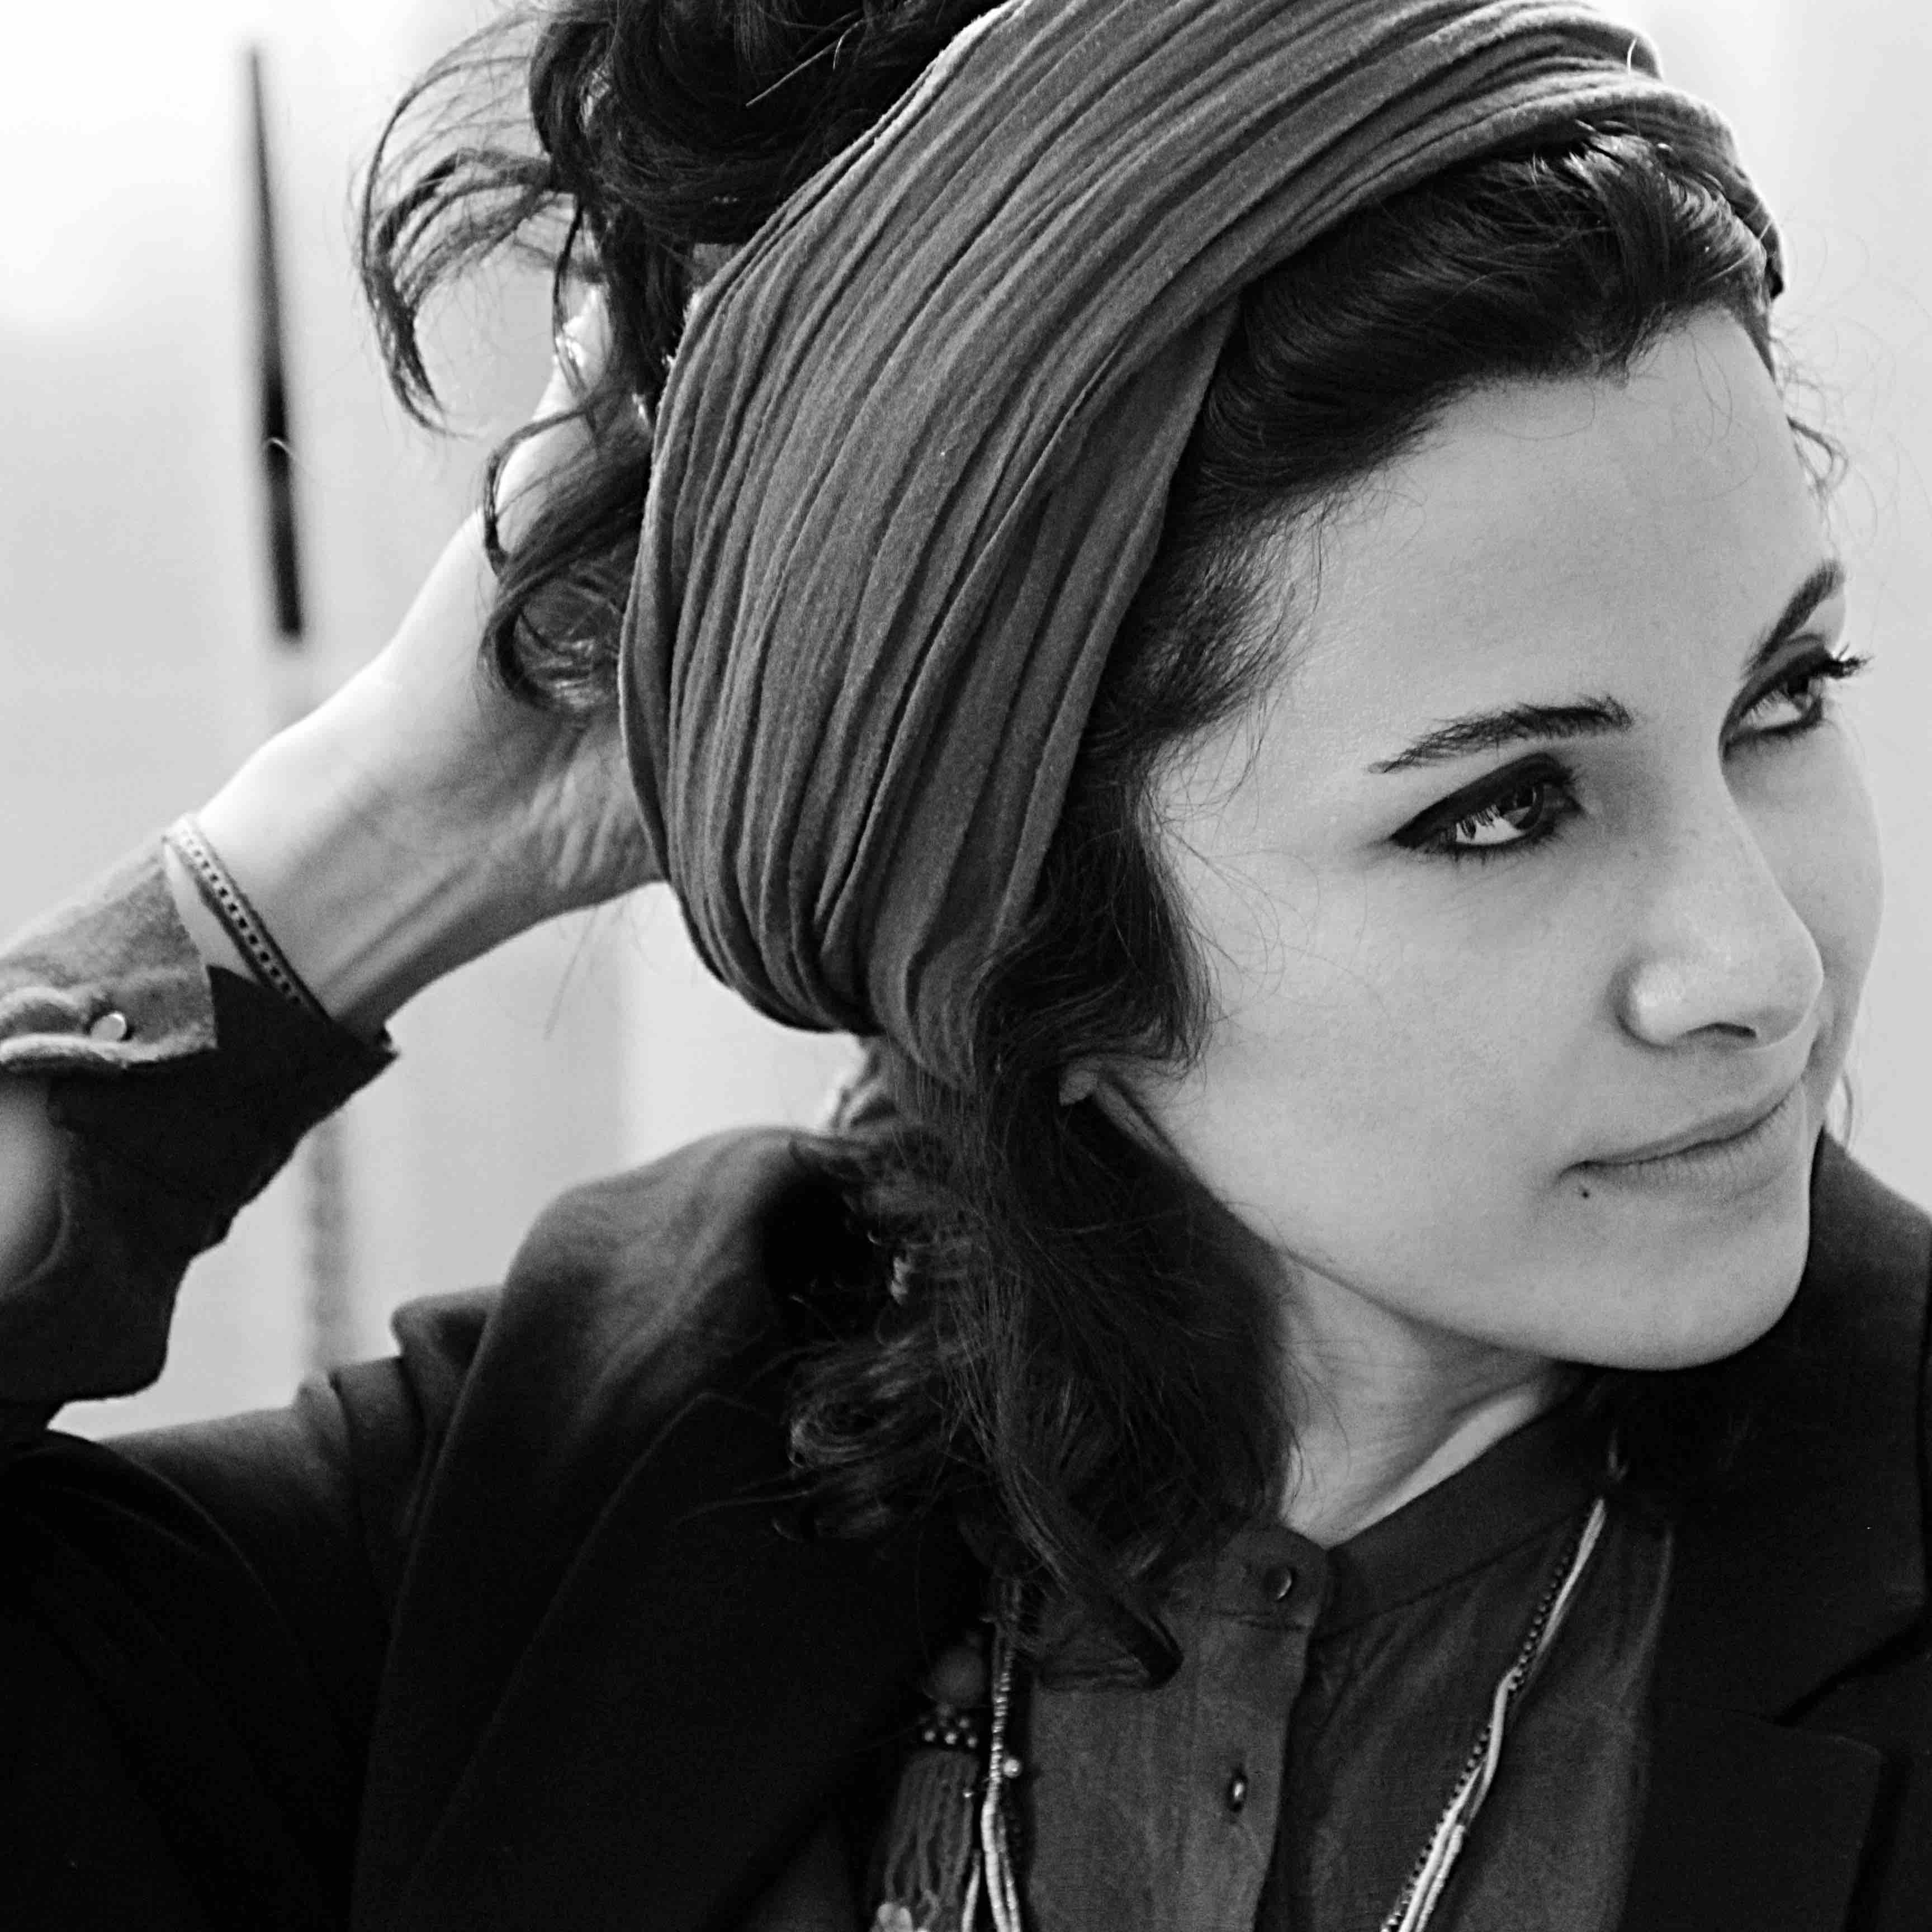 Director - Farnoosh Samadi - The Role